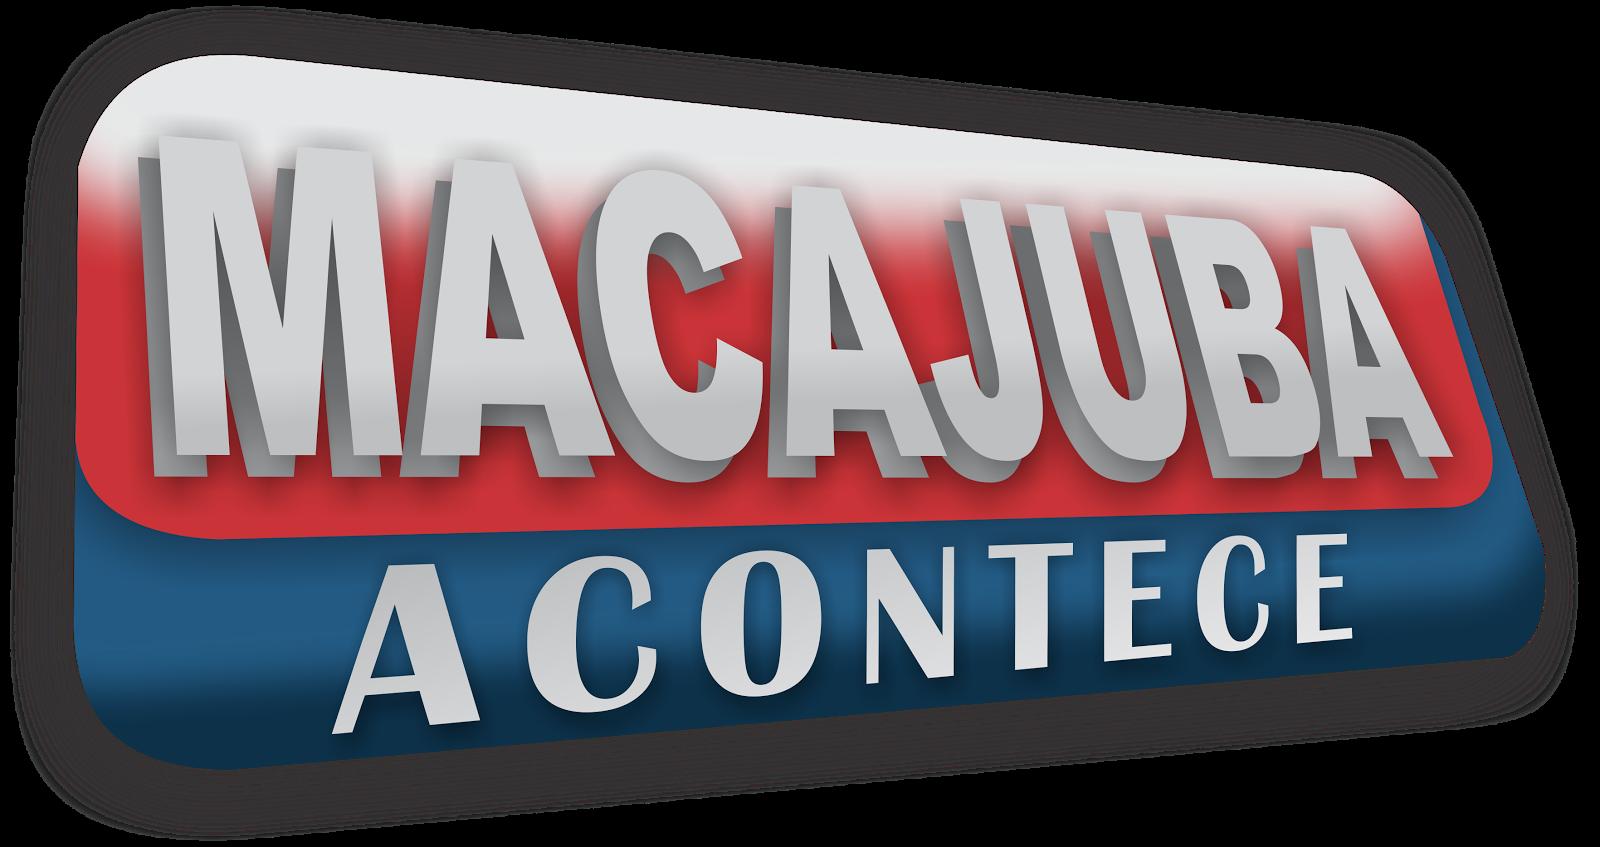 Blog Macajuba Acontece